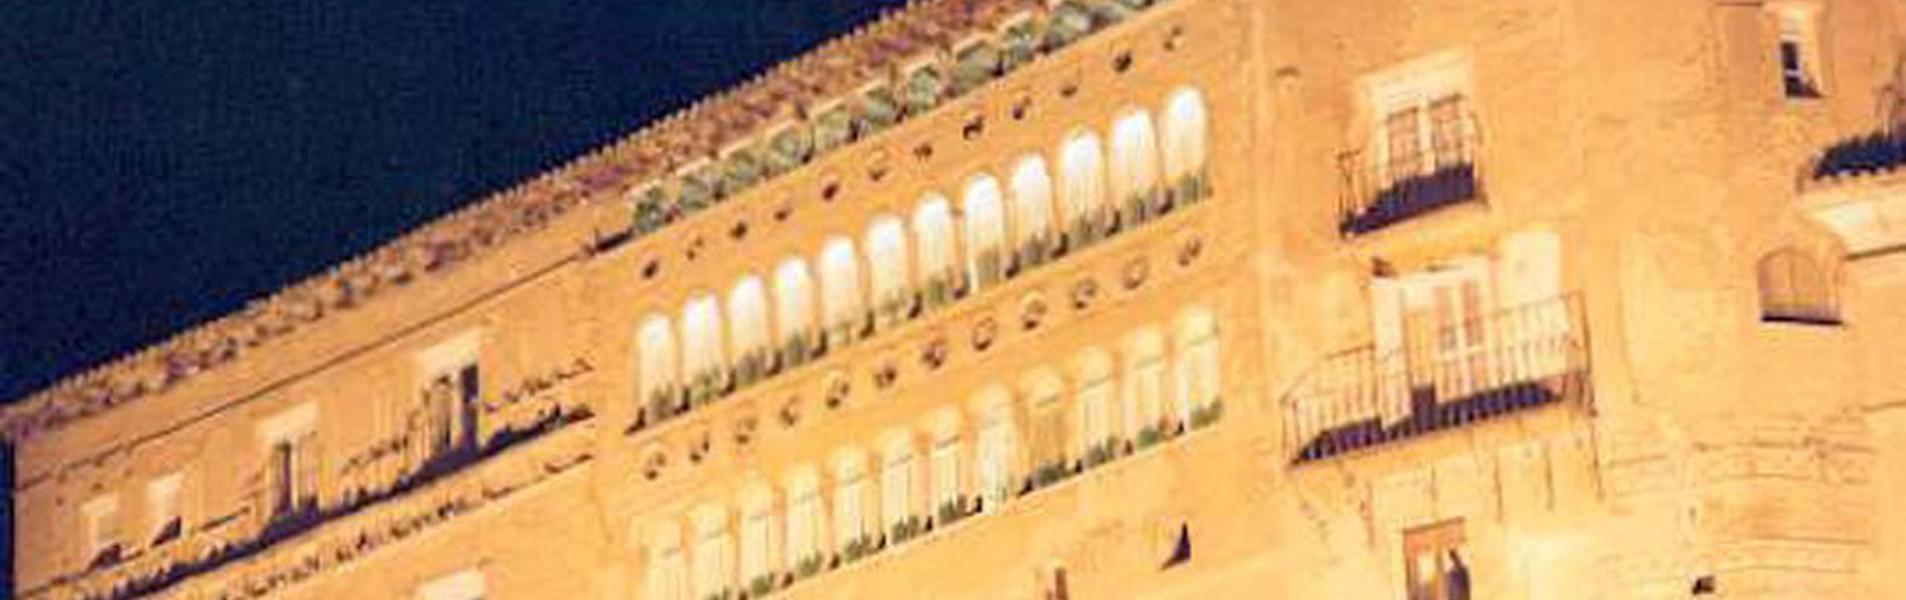 Palacio Episcopal de Tarazona